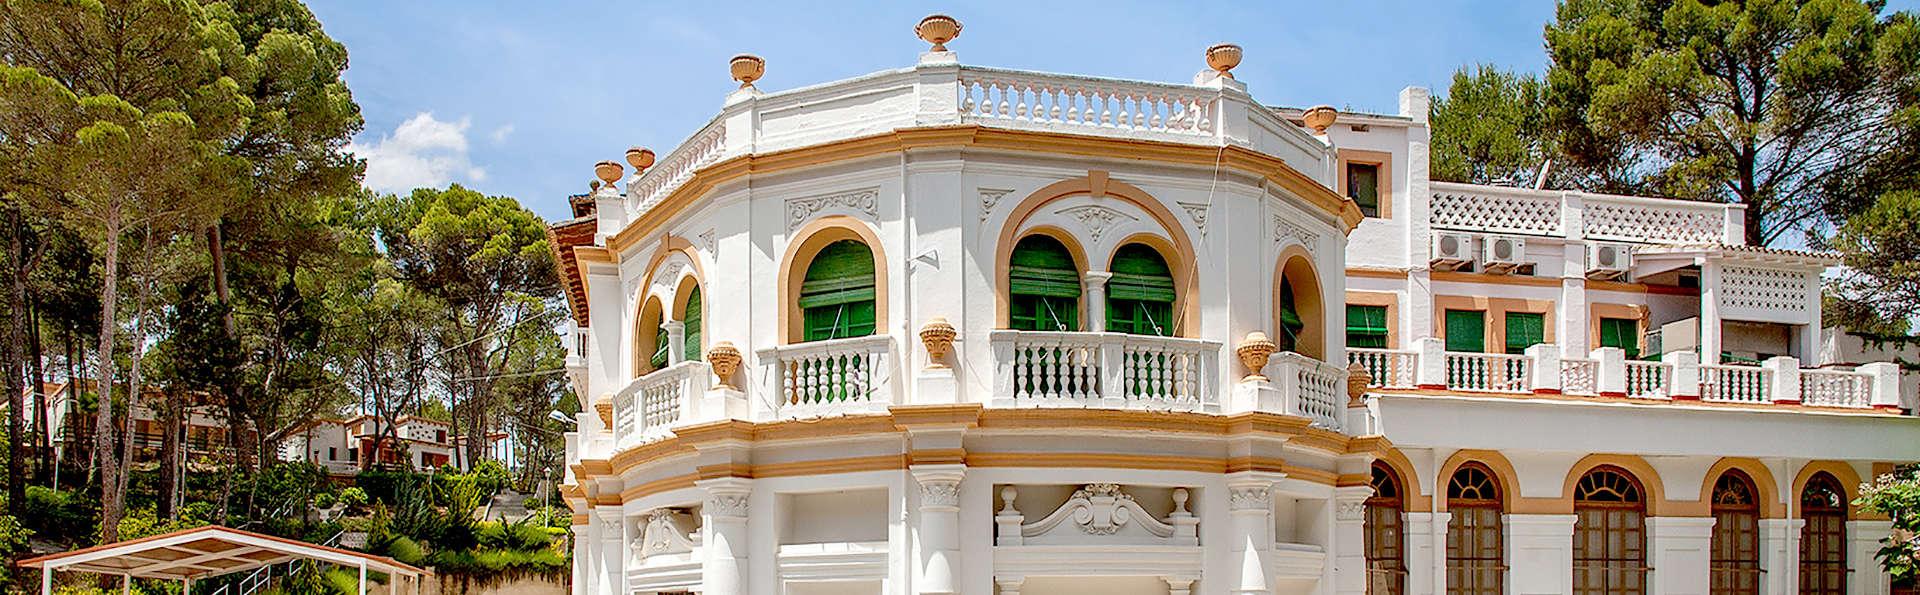 Hotel Balneario de Cofrentes  - Edit_Front.jpg